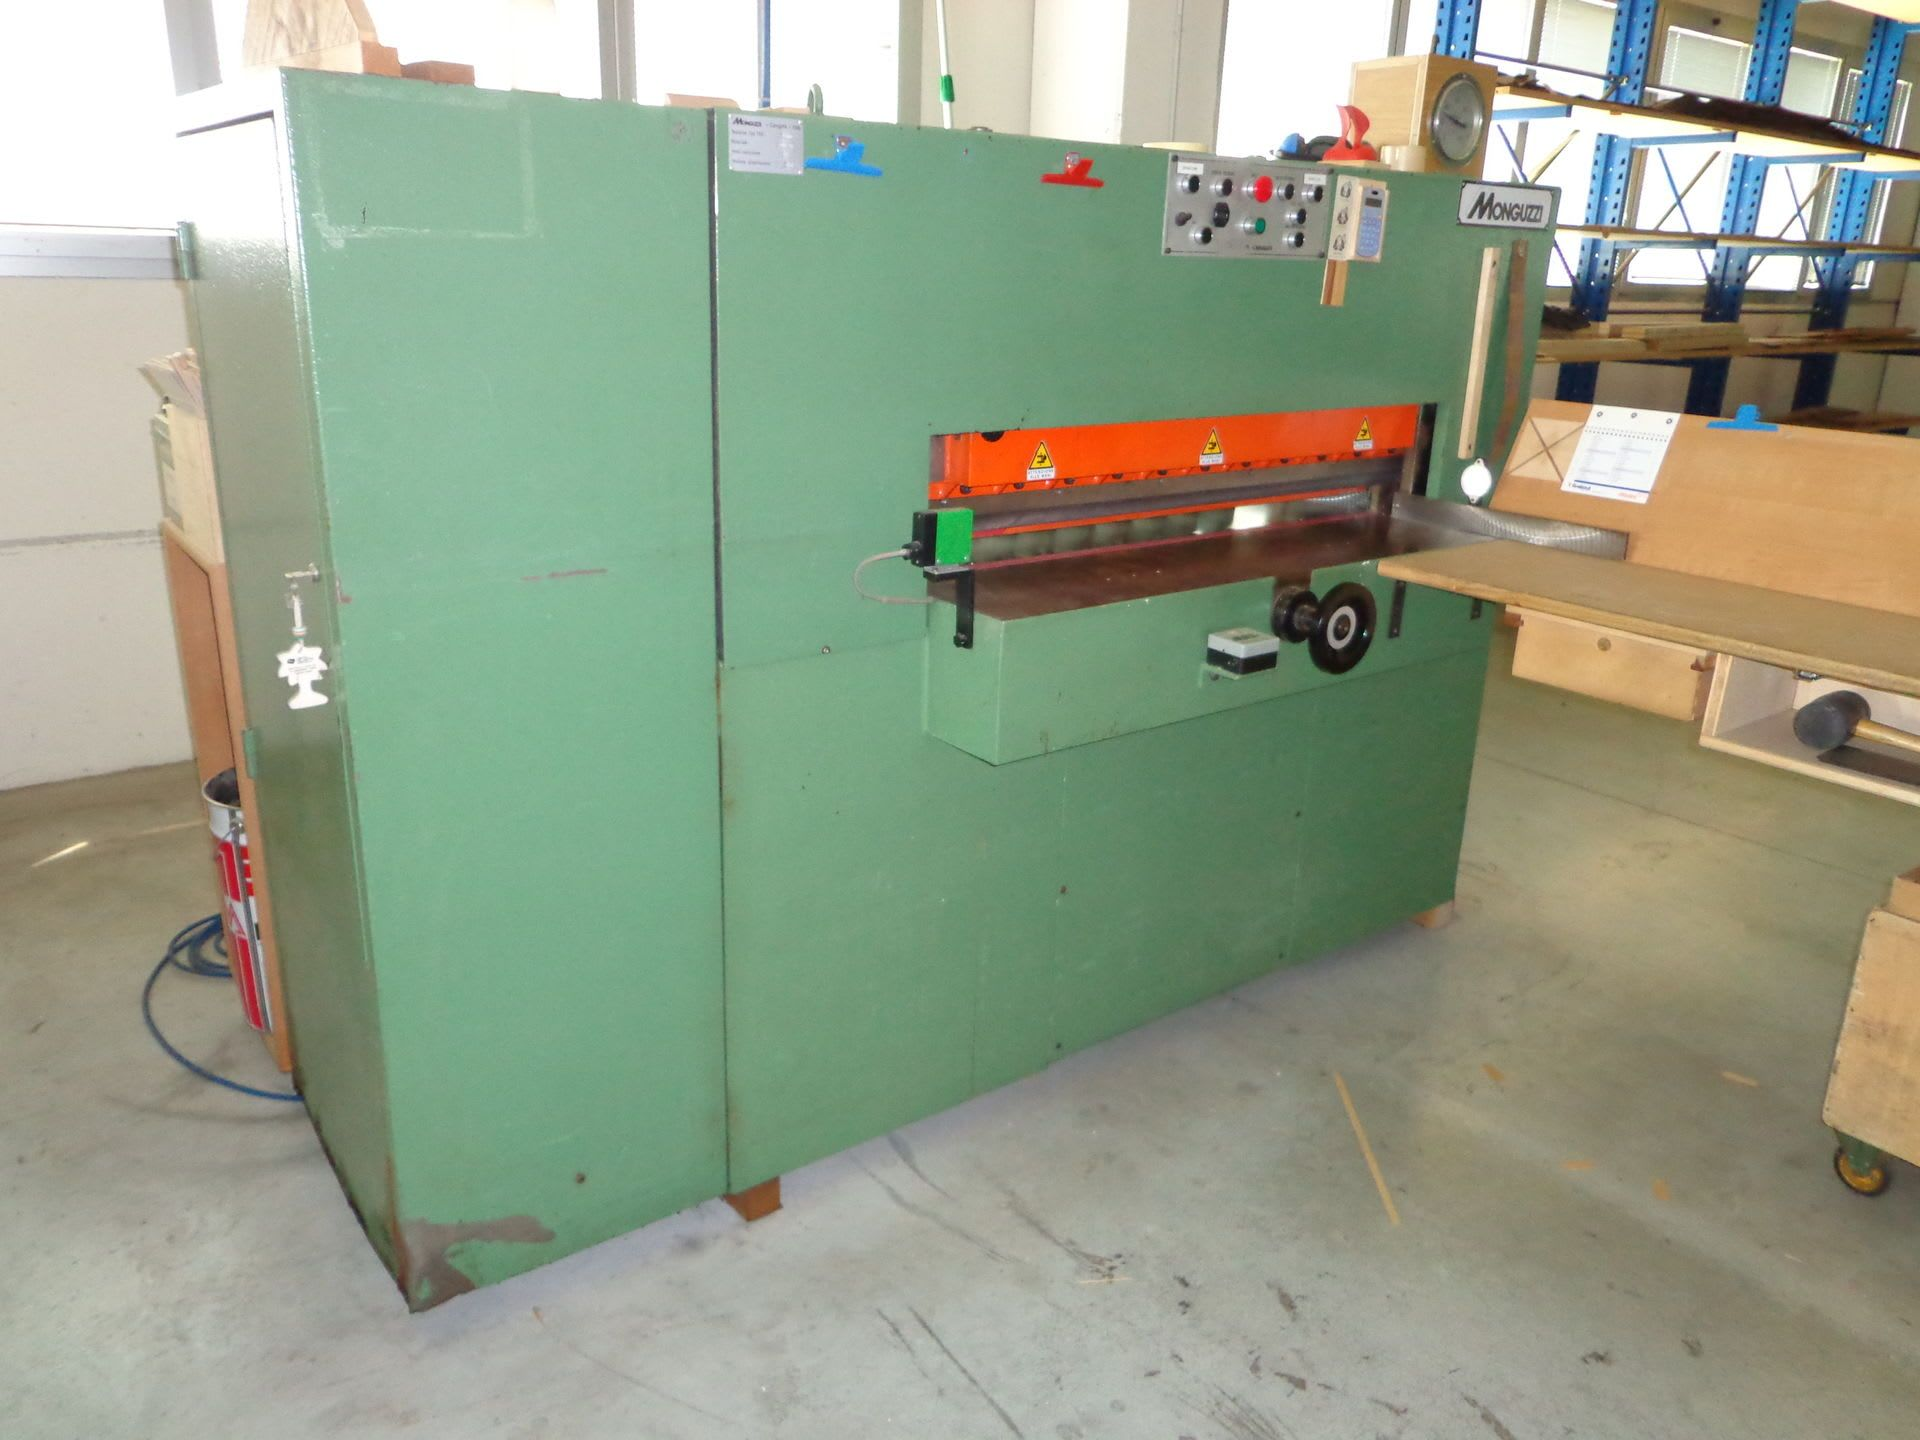 MONGUZZI TRA1200 Furnierschneidemaschine